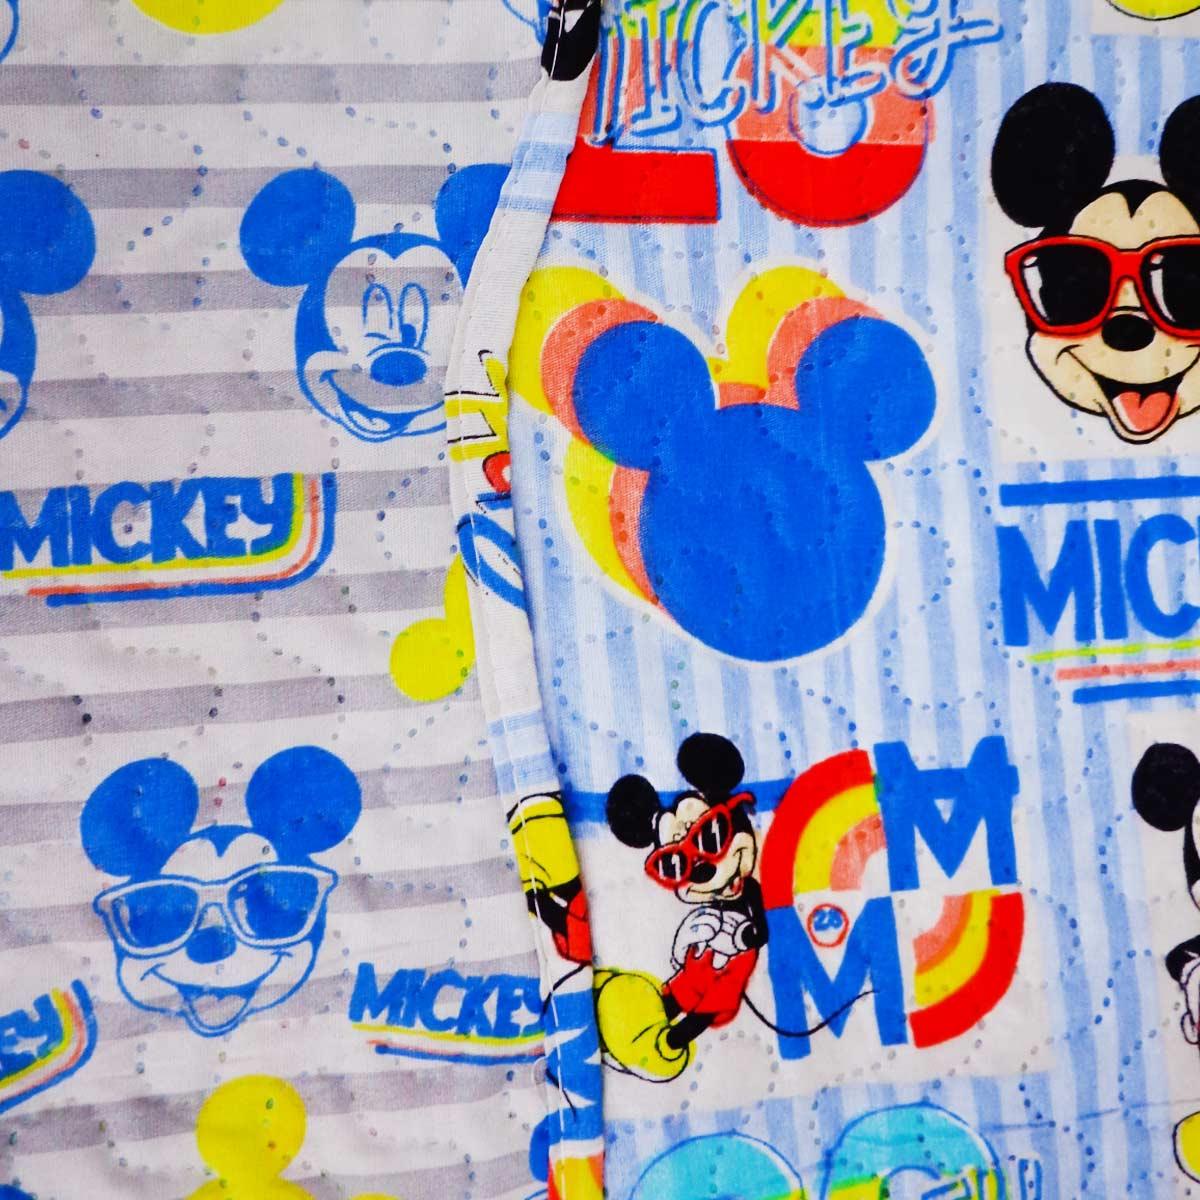 Colcha Infantil Mickey Mouse Menino Solteiro Ultrasonic Jolitex